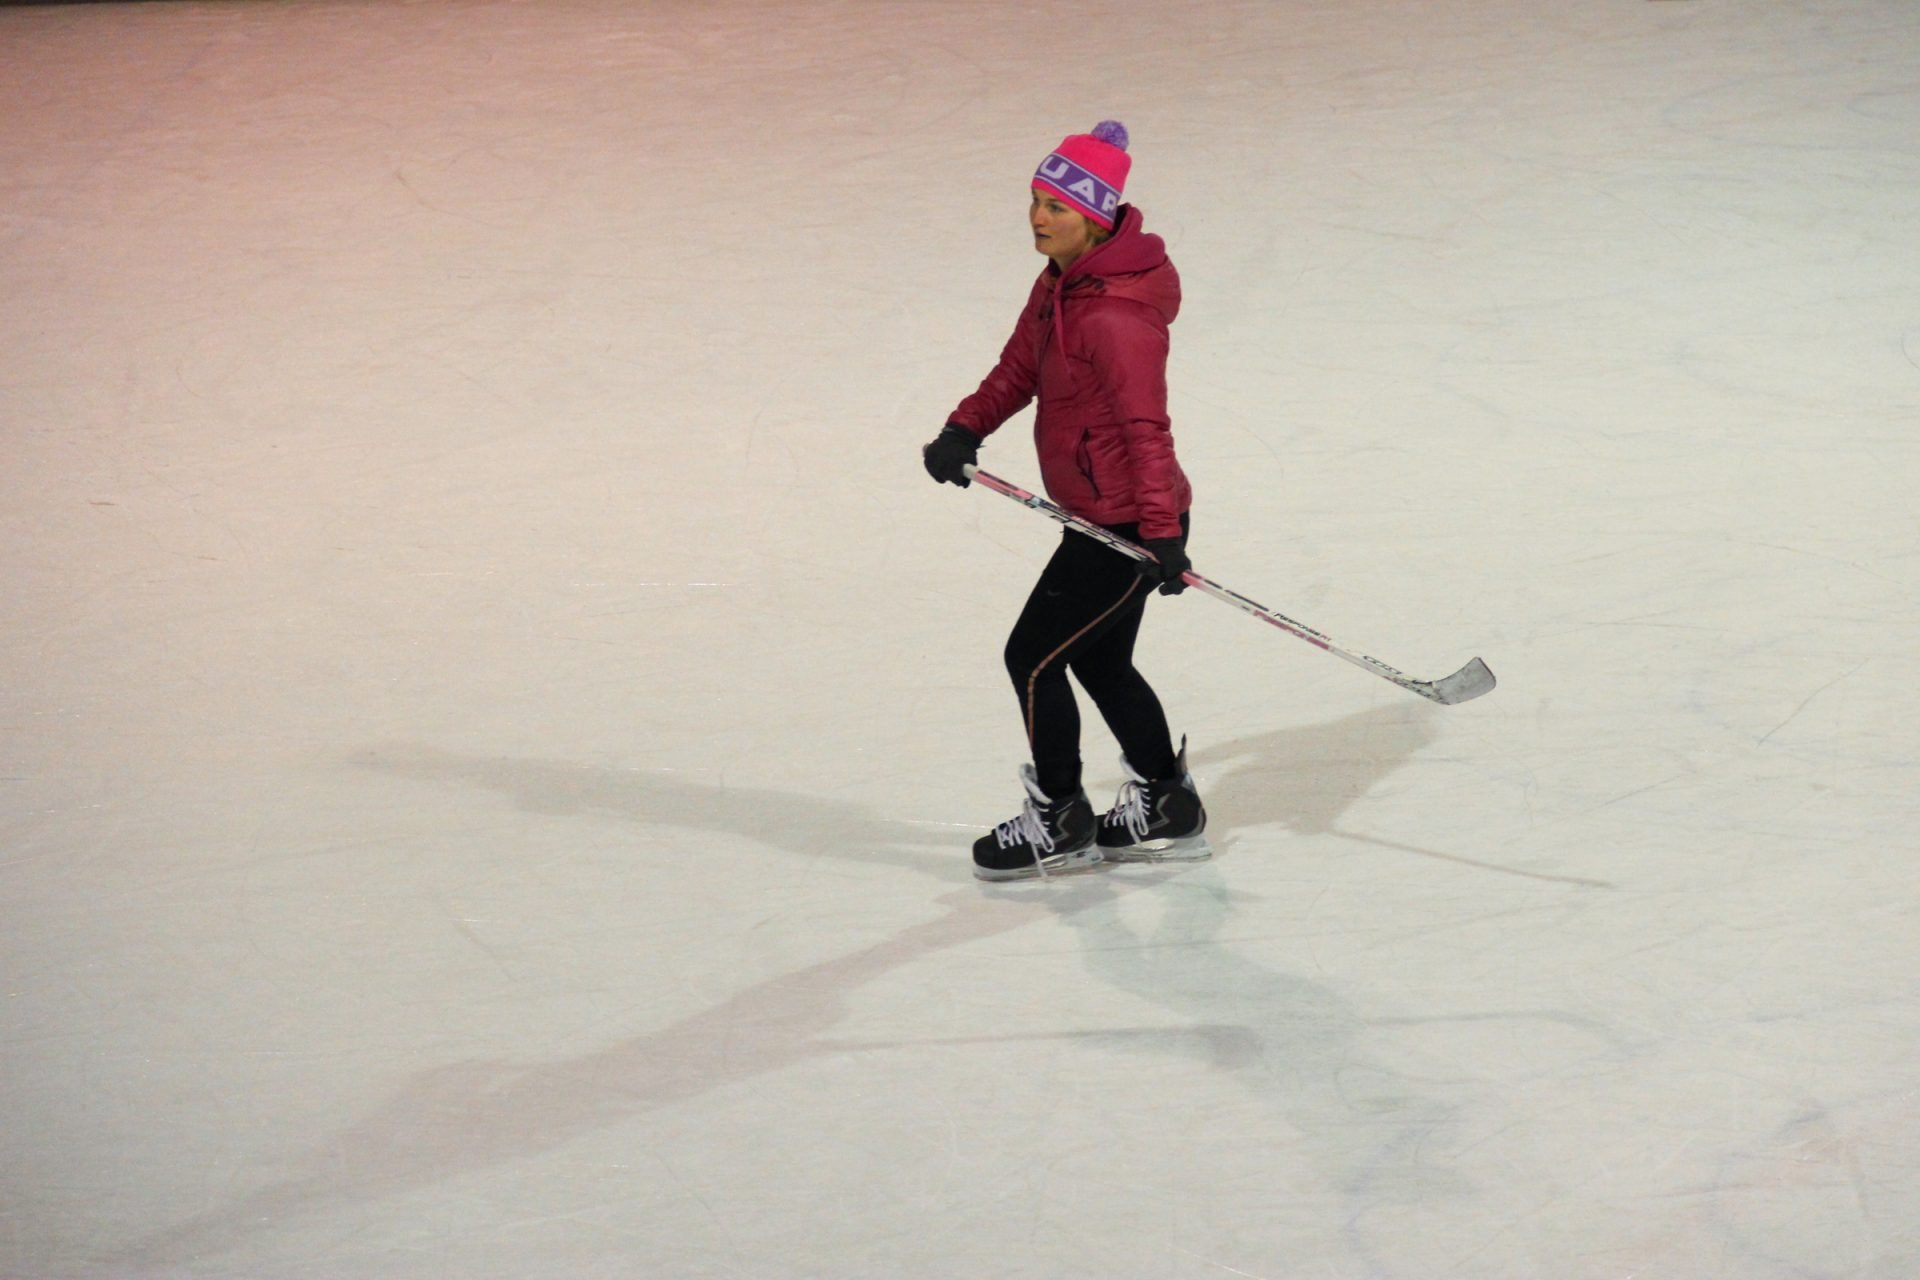 Girl with Hockey Stick on Ice